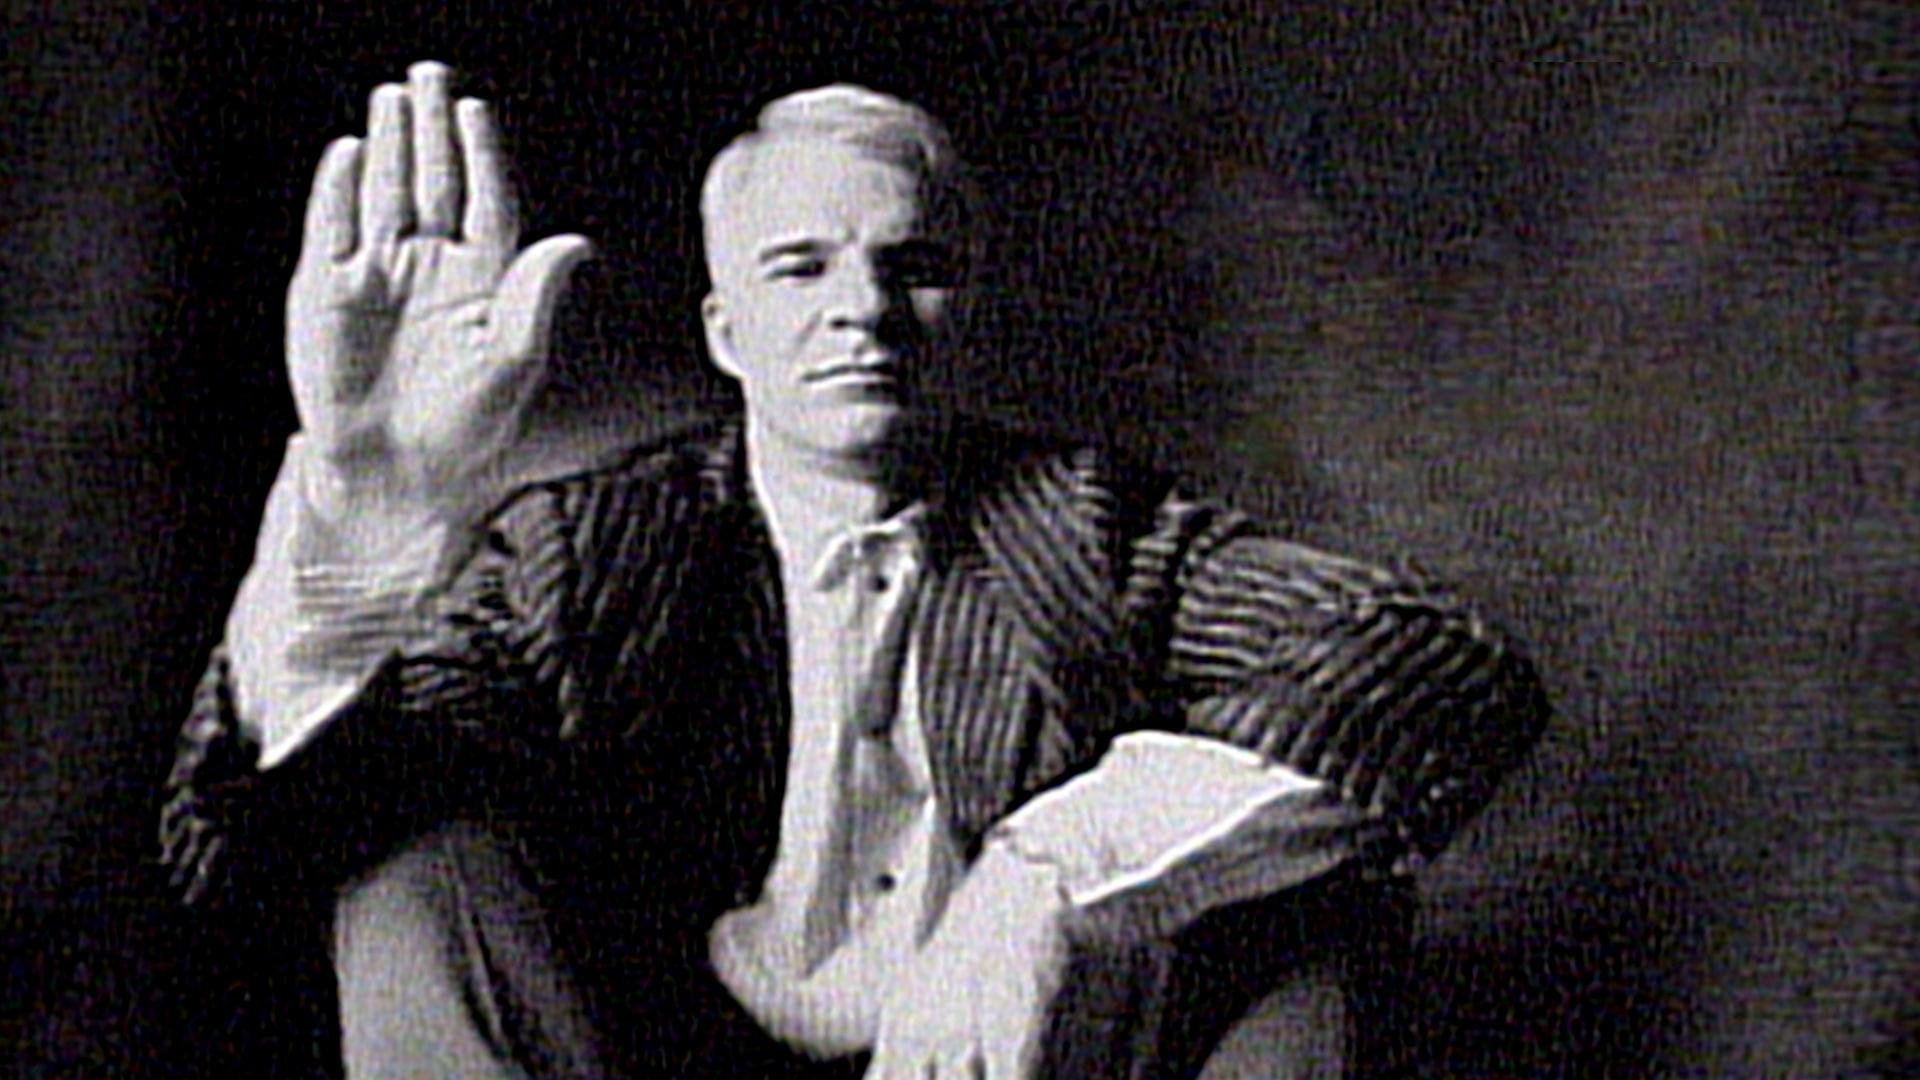 Steve Martin: October 17, 1987